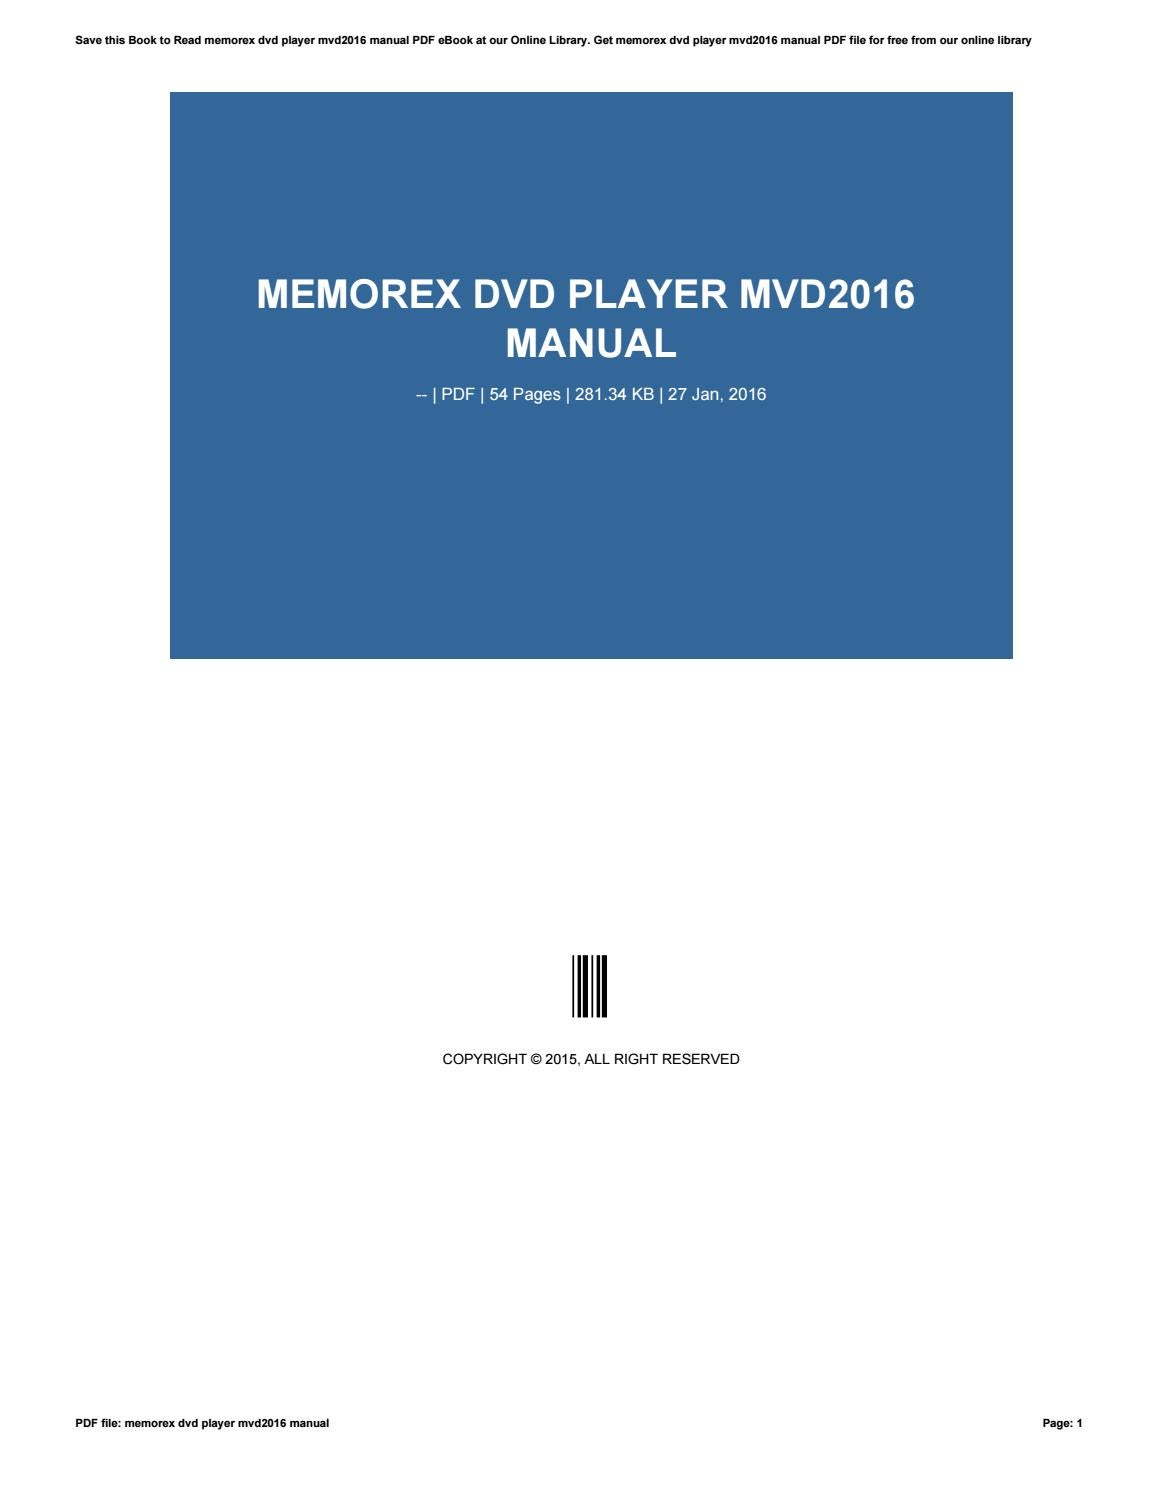 memorex dvd player mvd2016 manual by aju28 issuu rh issuu com  memorex model mvd2016blk manual